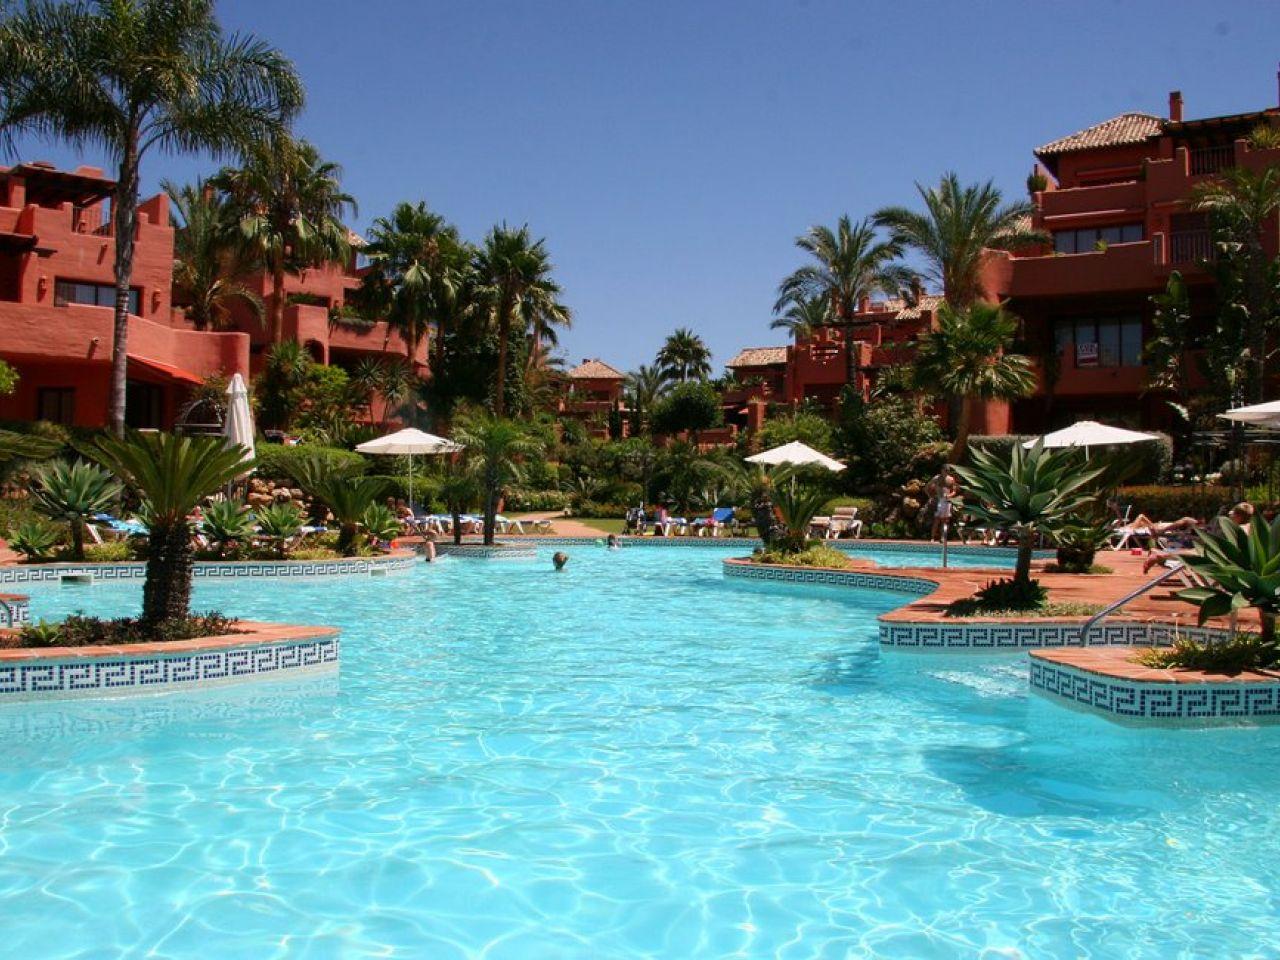 Appartement pour l Vente à KSSIR-22271P Menara Beach Other Costa Del Sol, Costa Del Sol 29680 Espagne